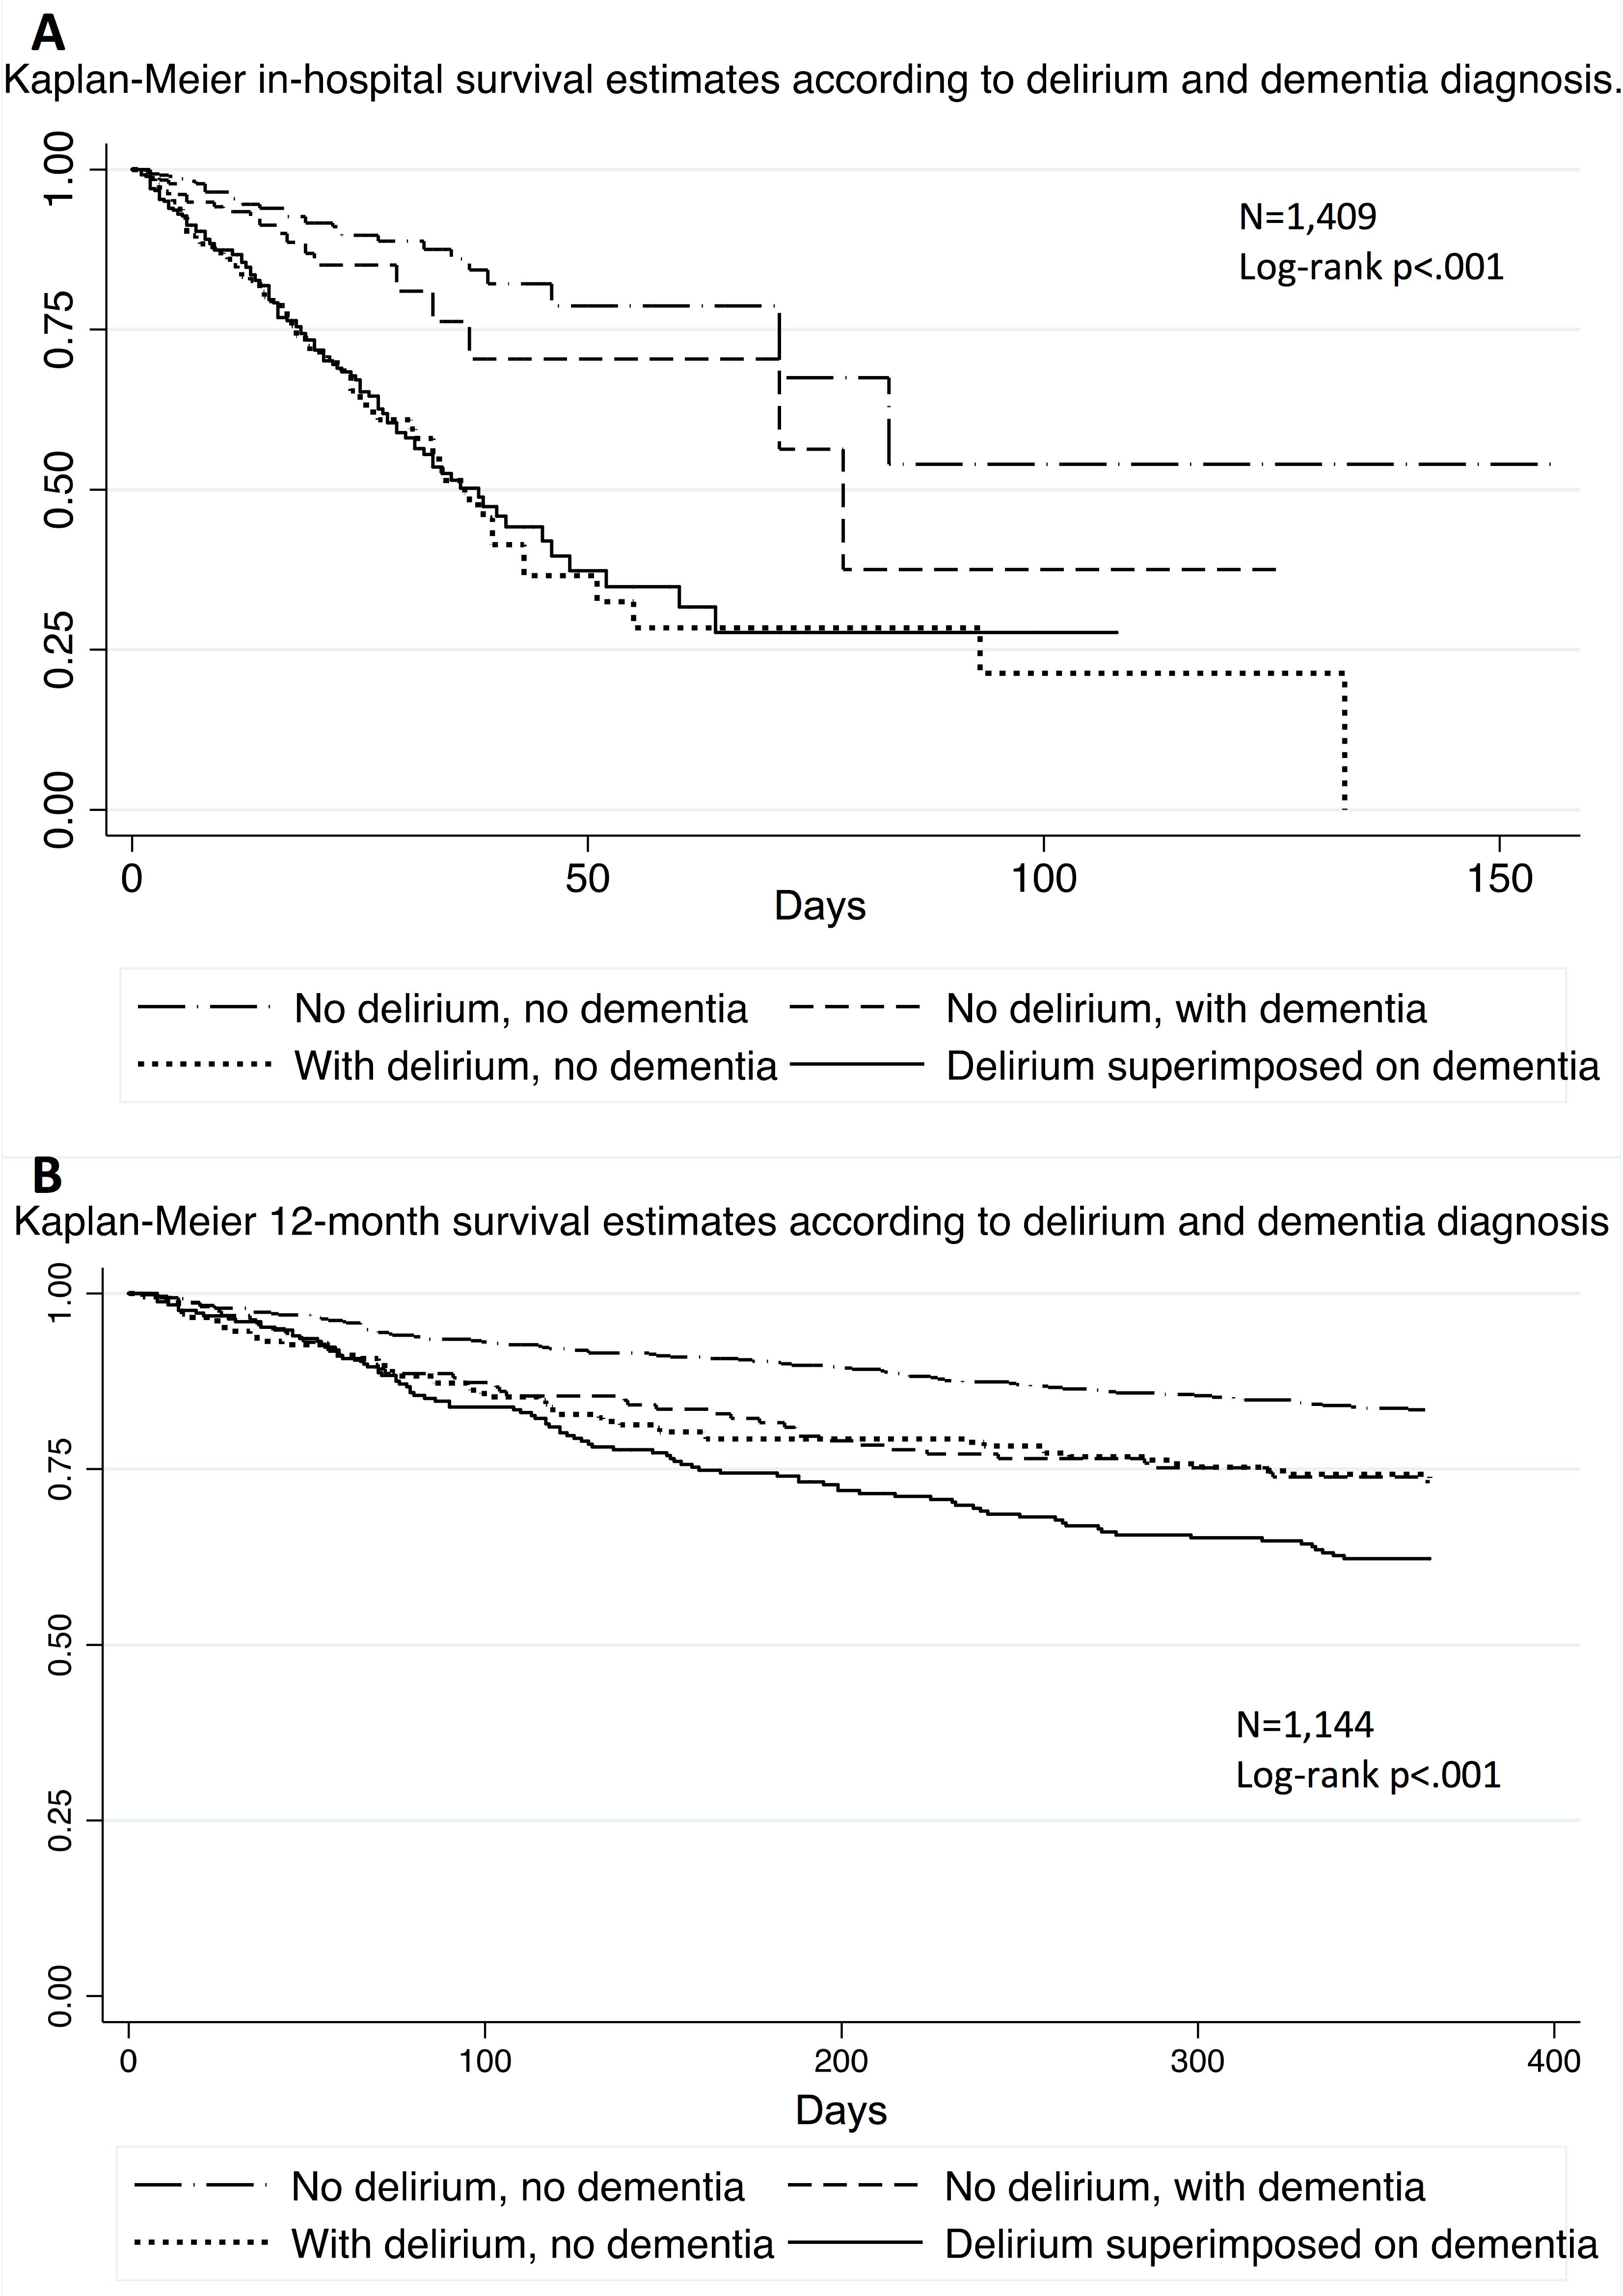 Probability of survival according to delirium and dementia diagnosis.